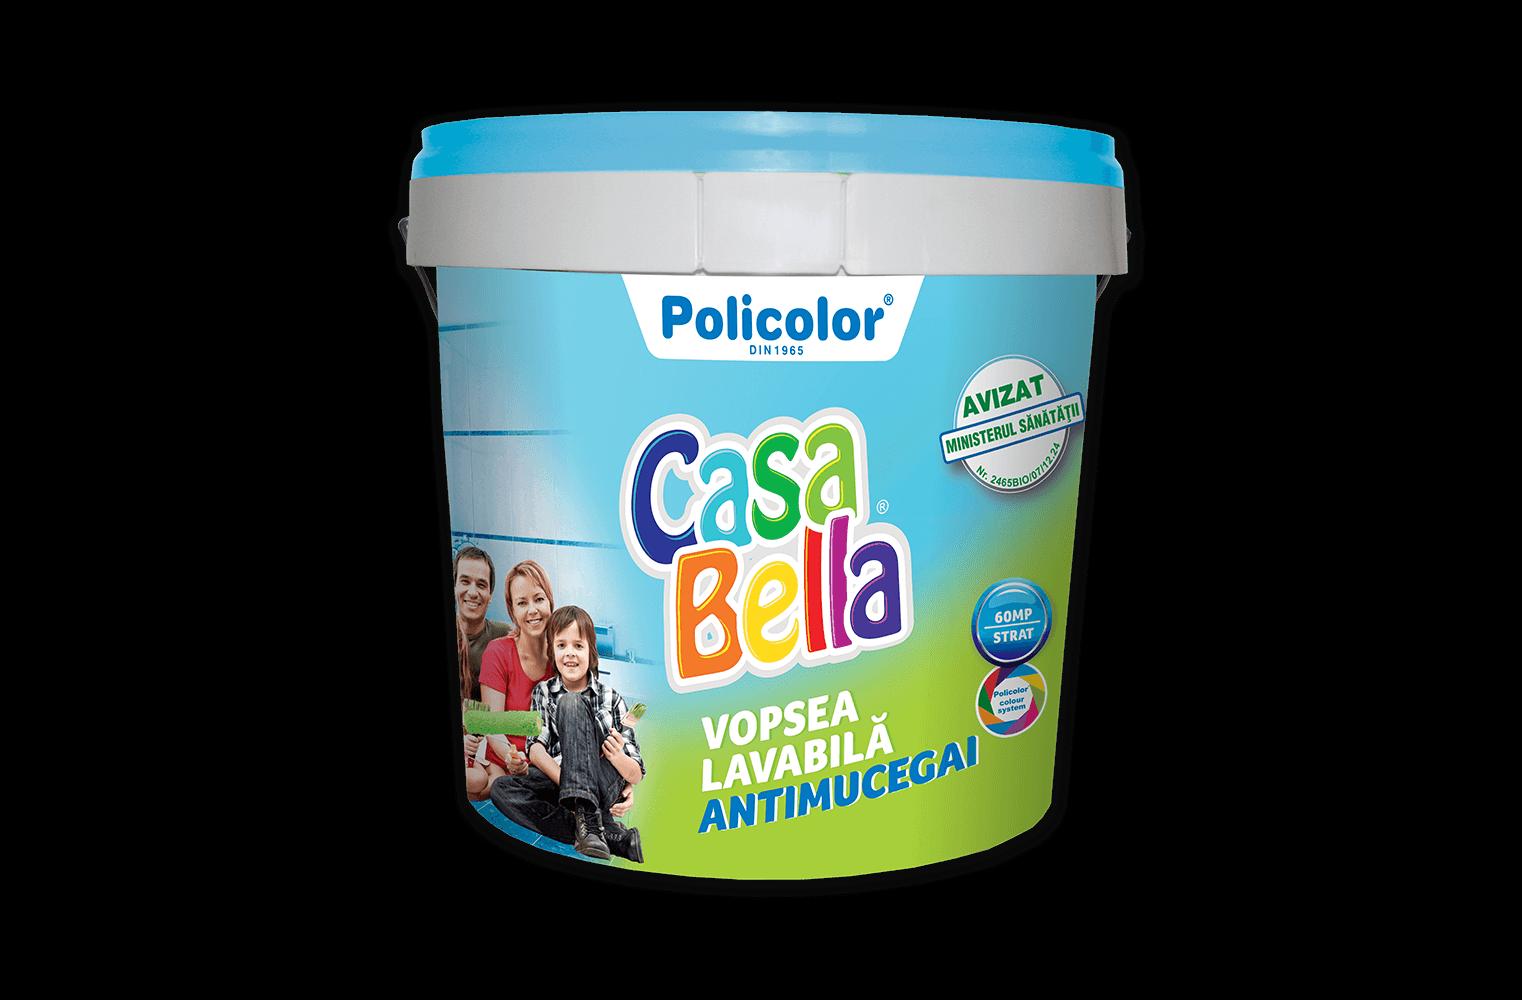 CasaBella Brand